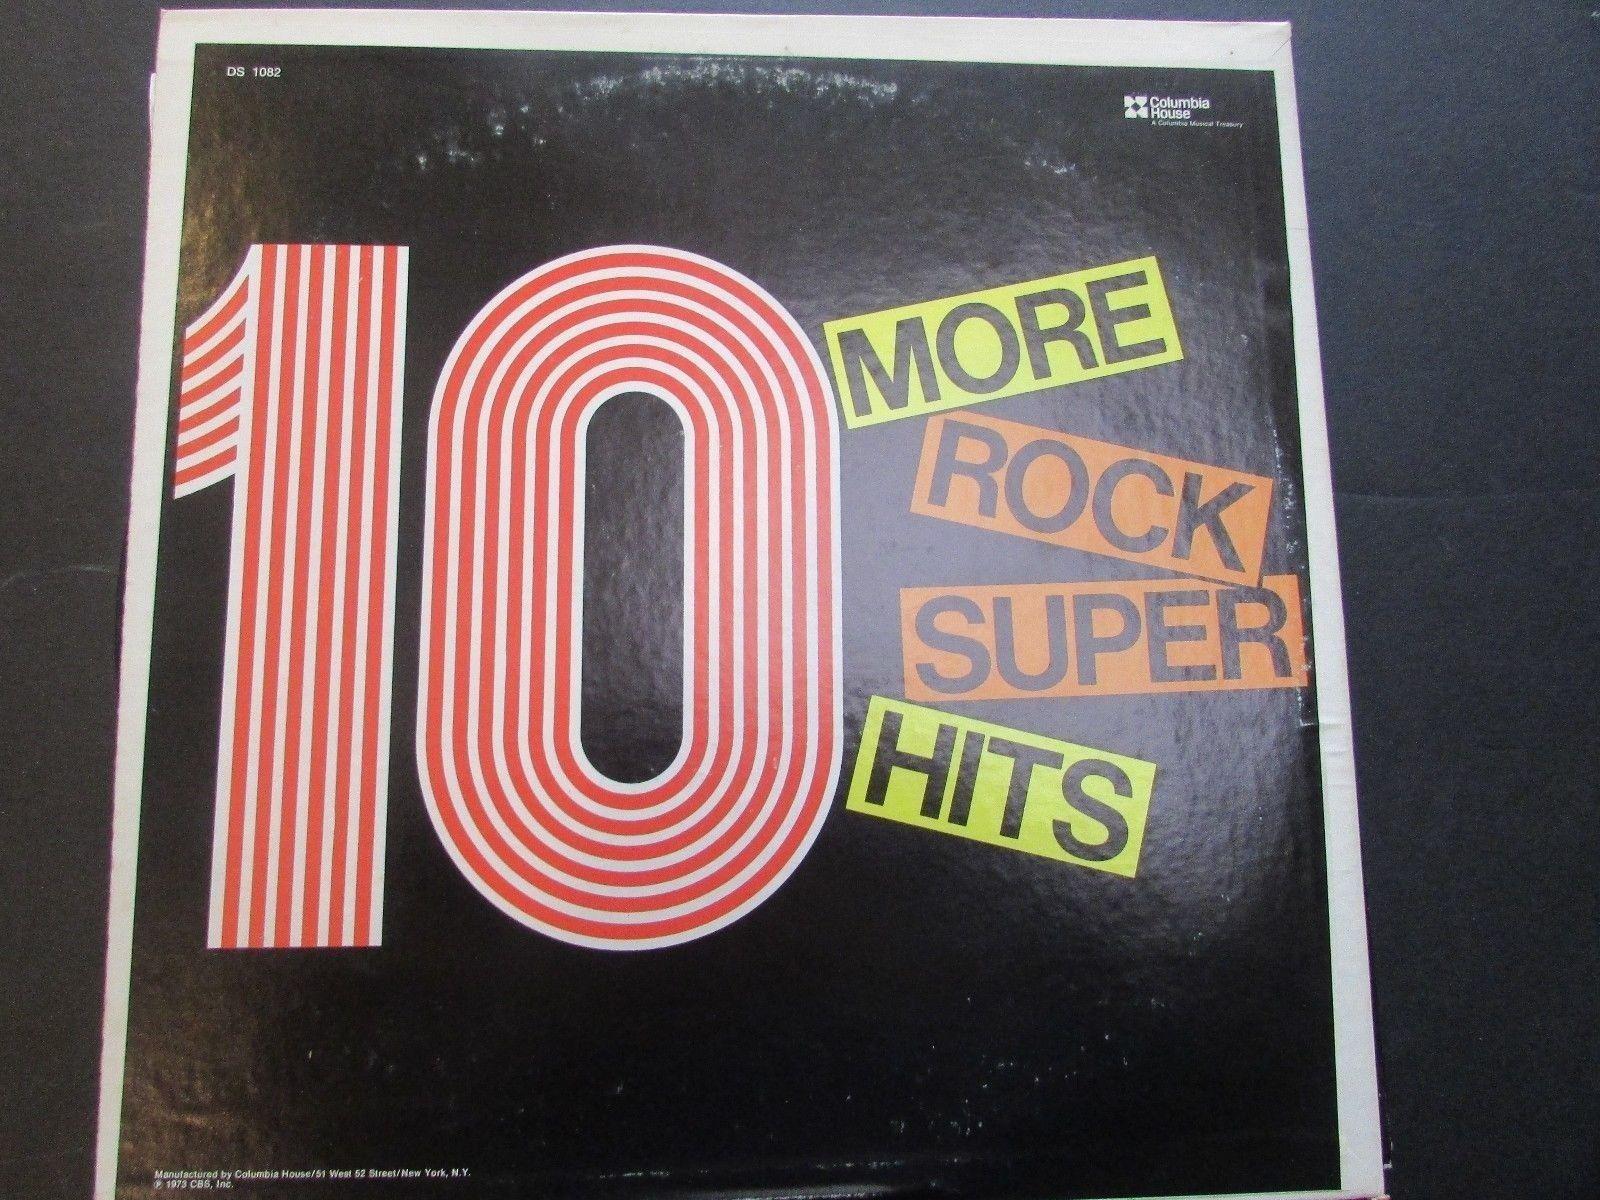 10 more rock.jpg